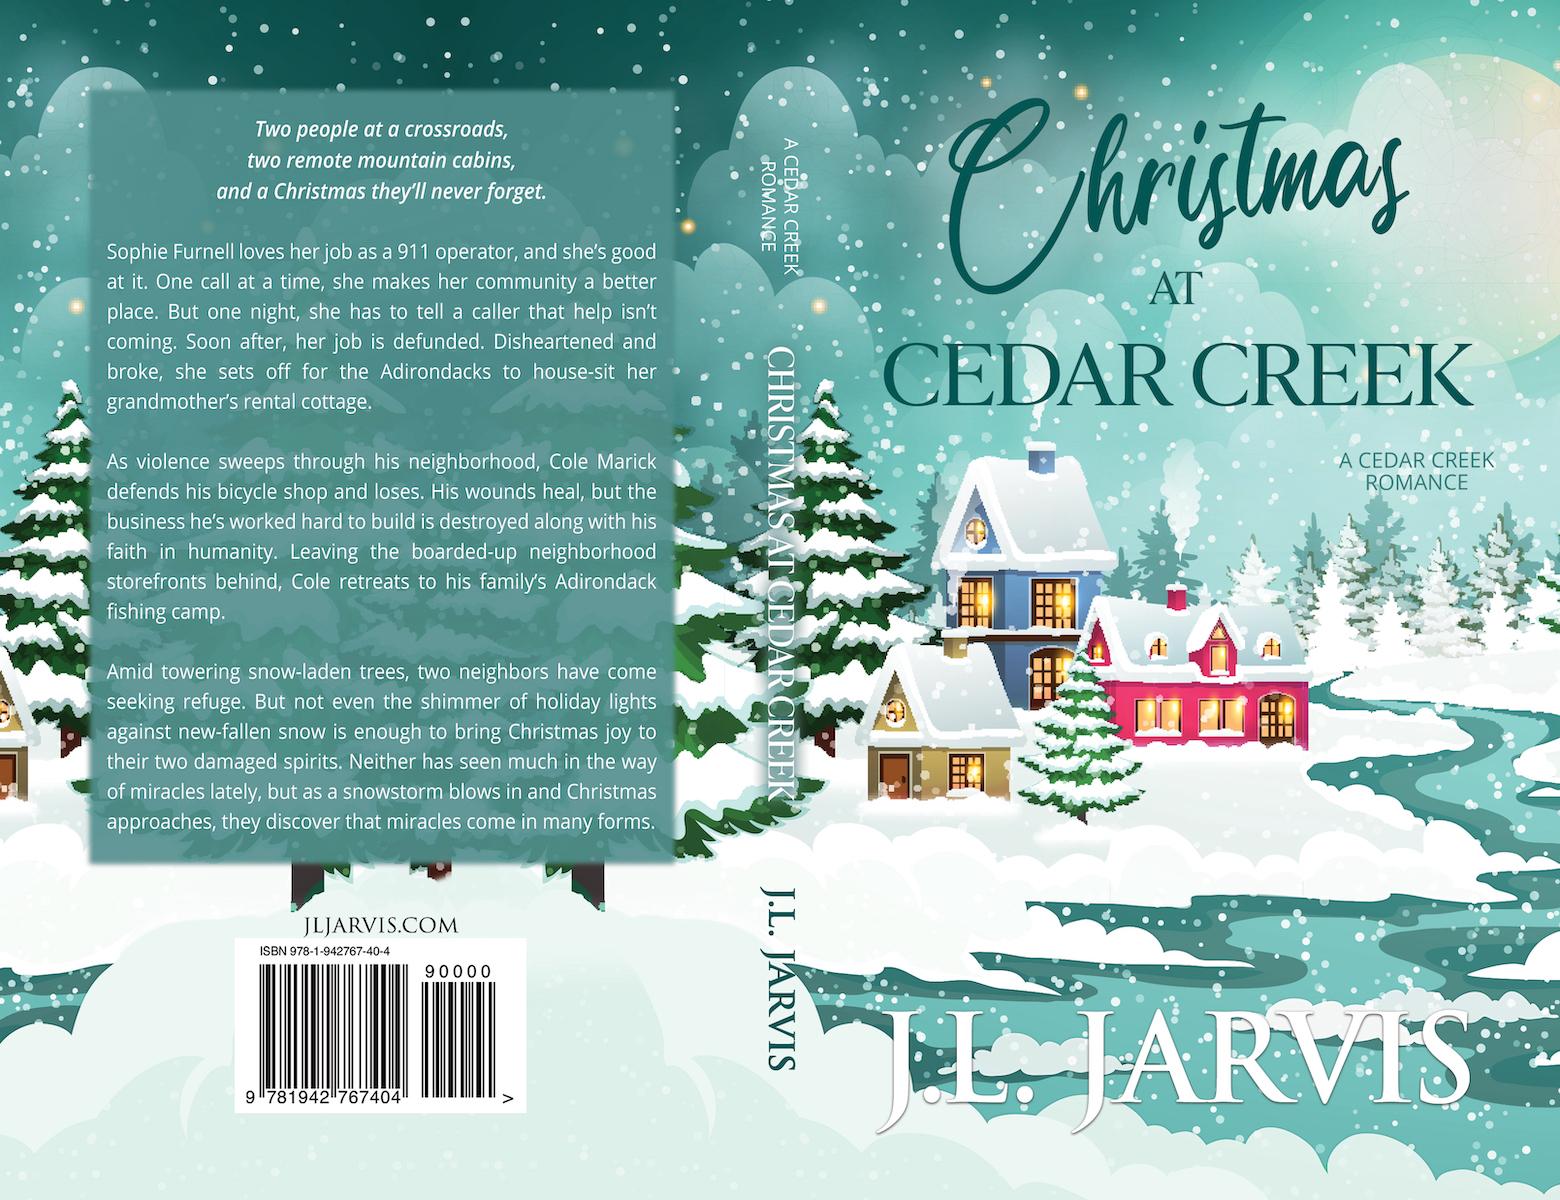 Christmas at Cedar Creek